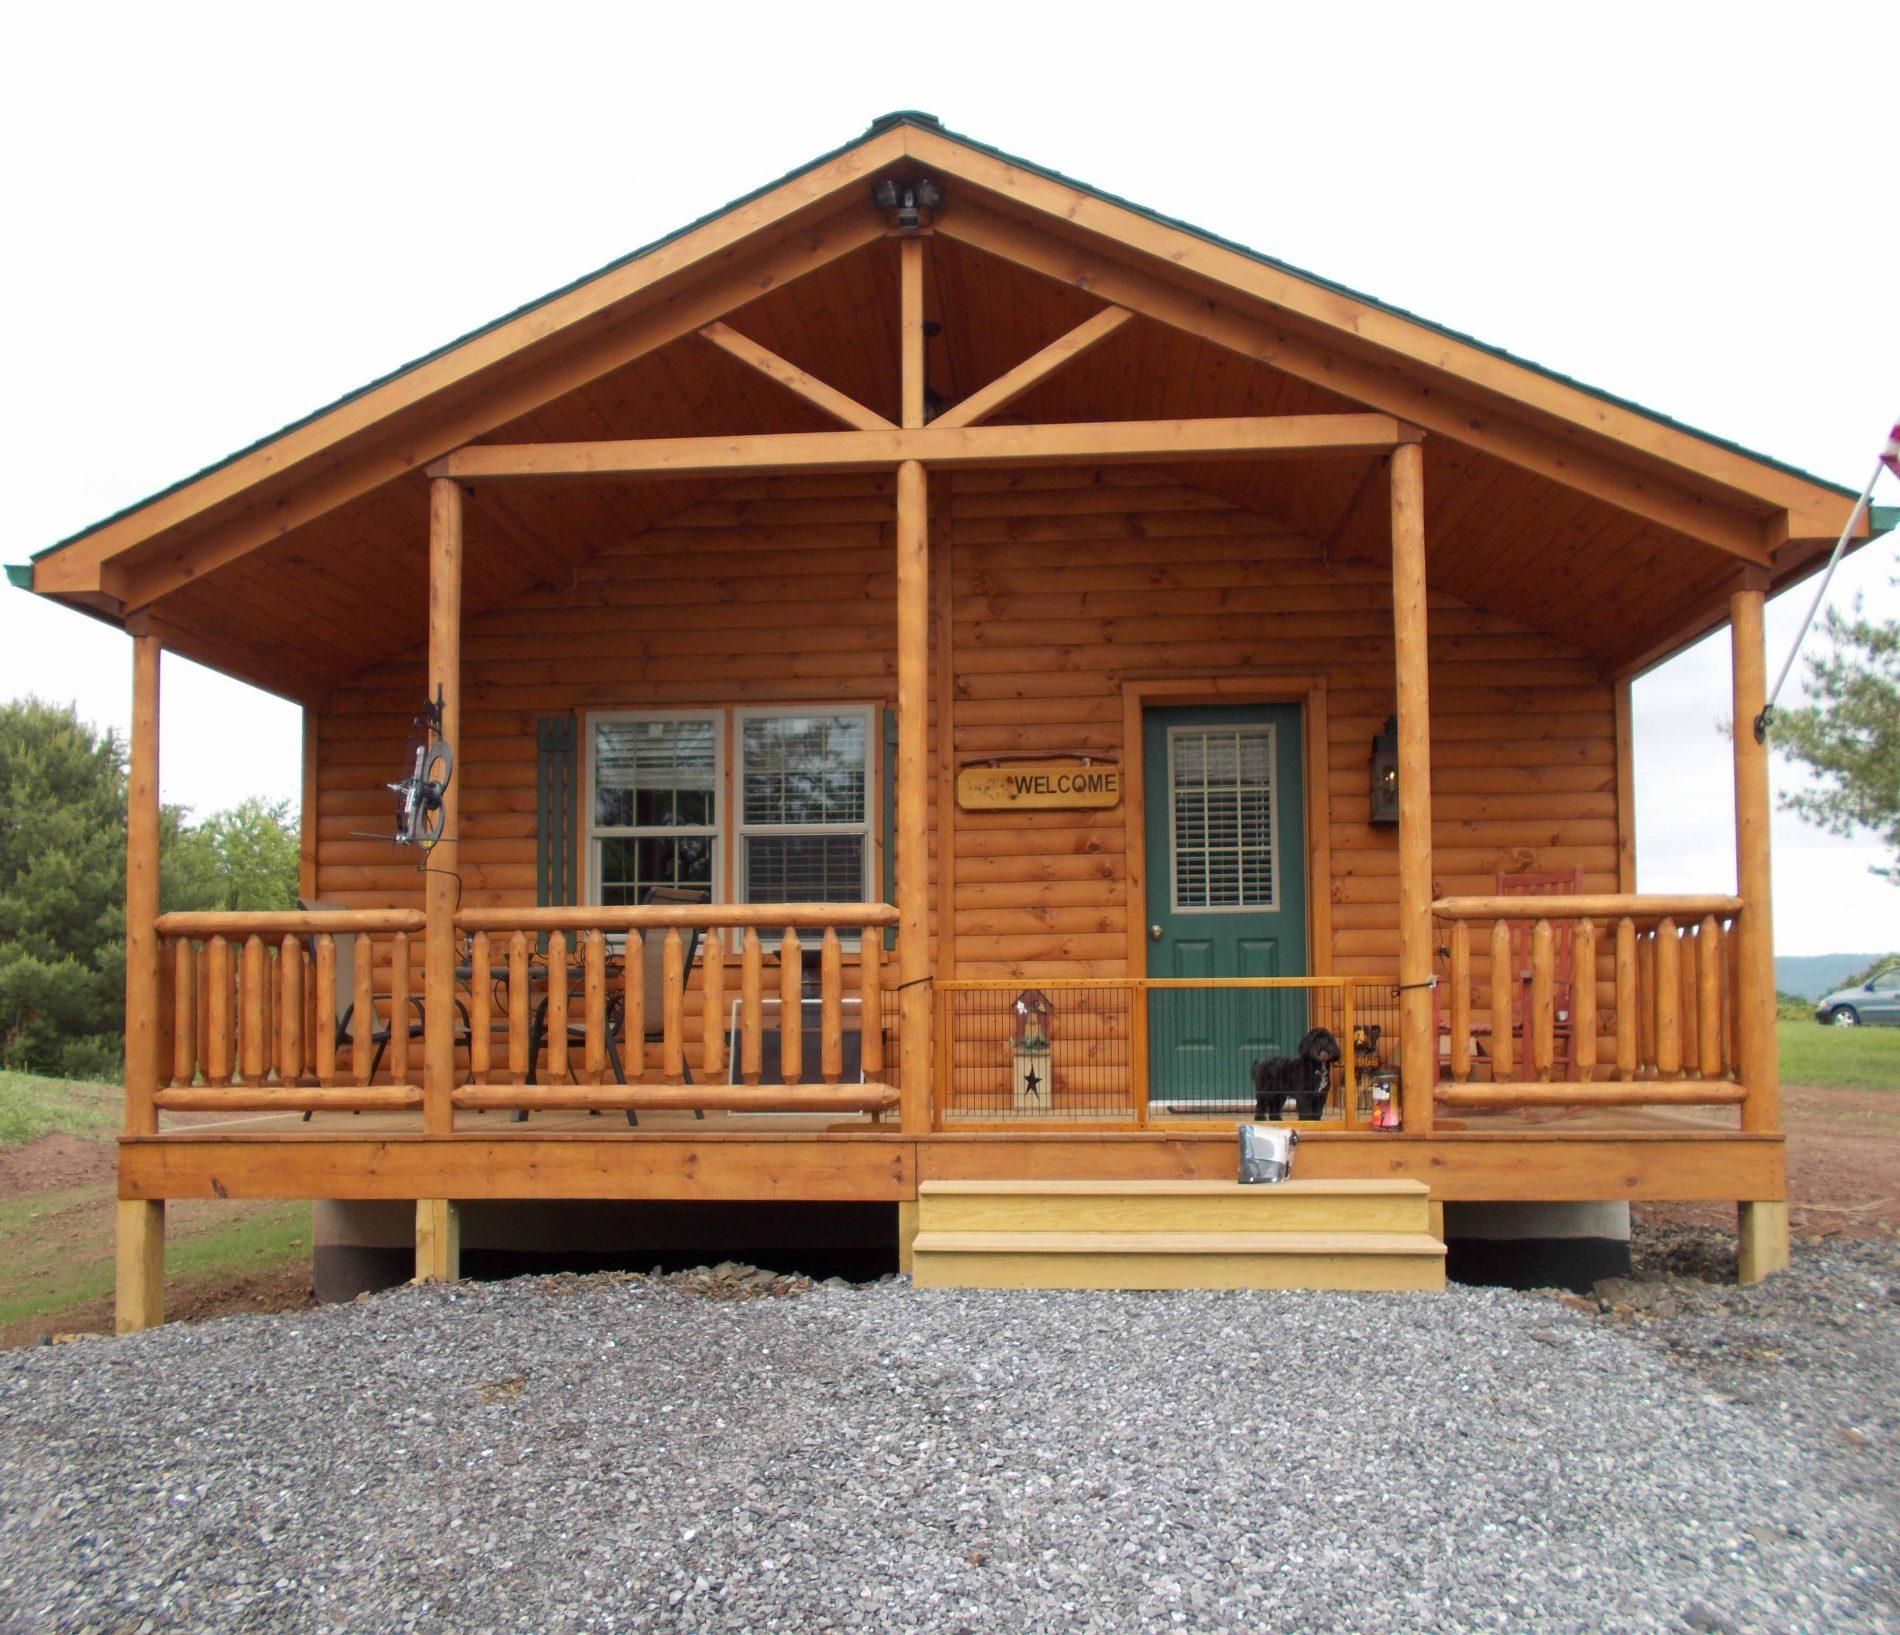 Testimonials log cabin modular homes zook cabins for Vacation log homes